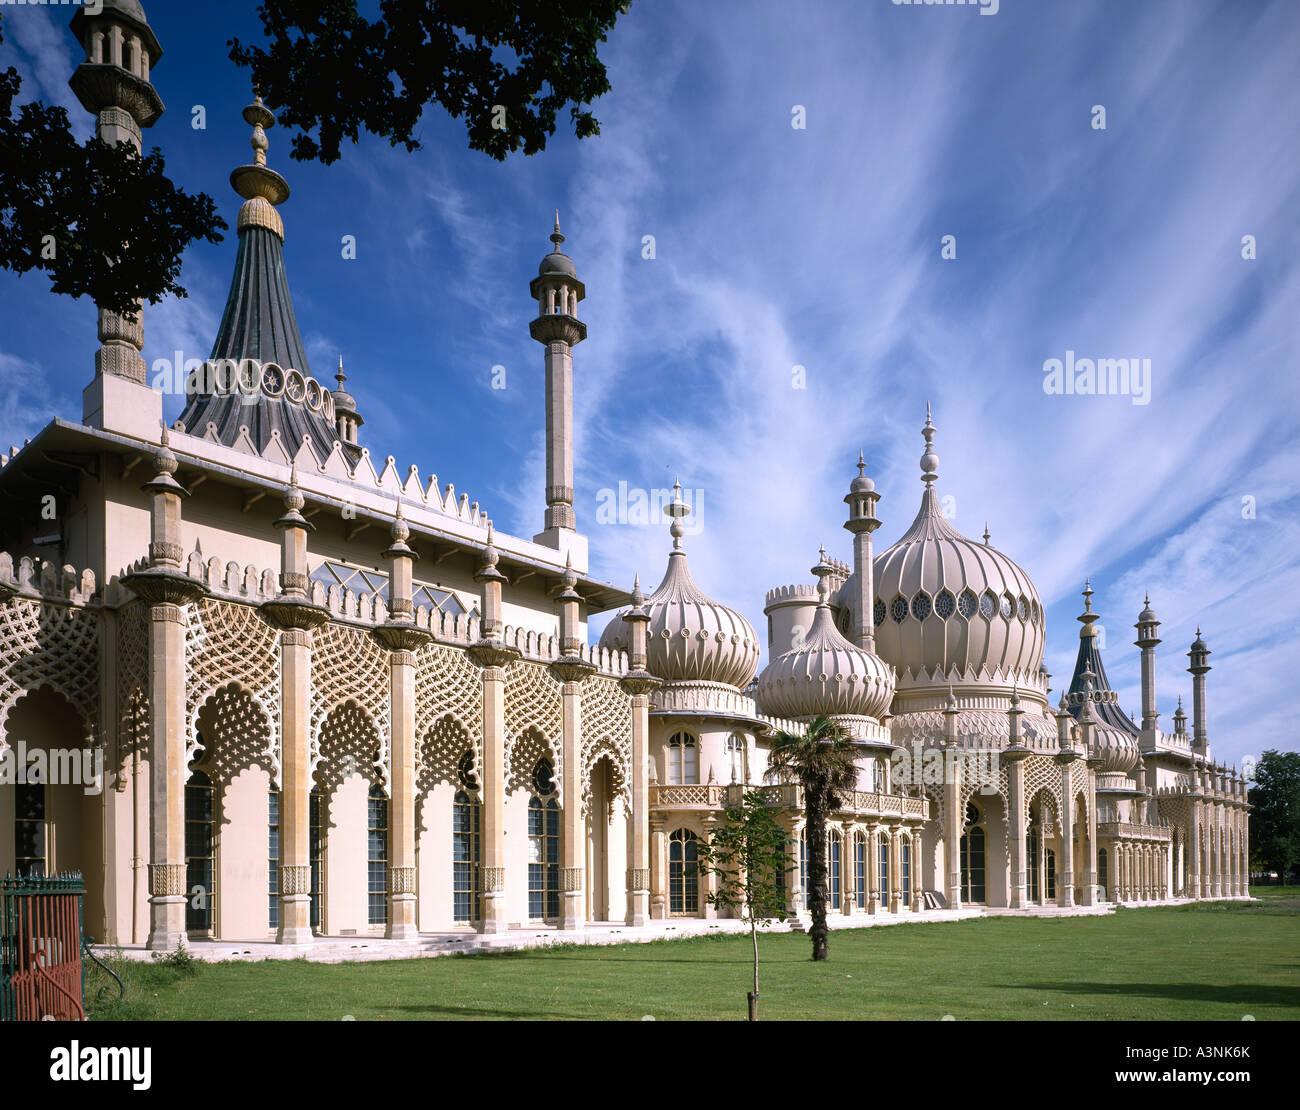 Royal Pavilion Brighton Sussex England UK - Stock Image